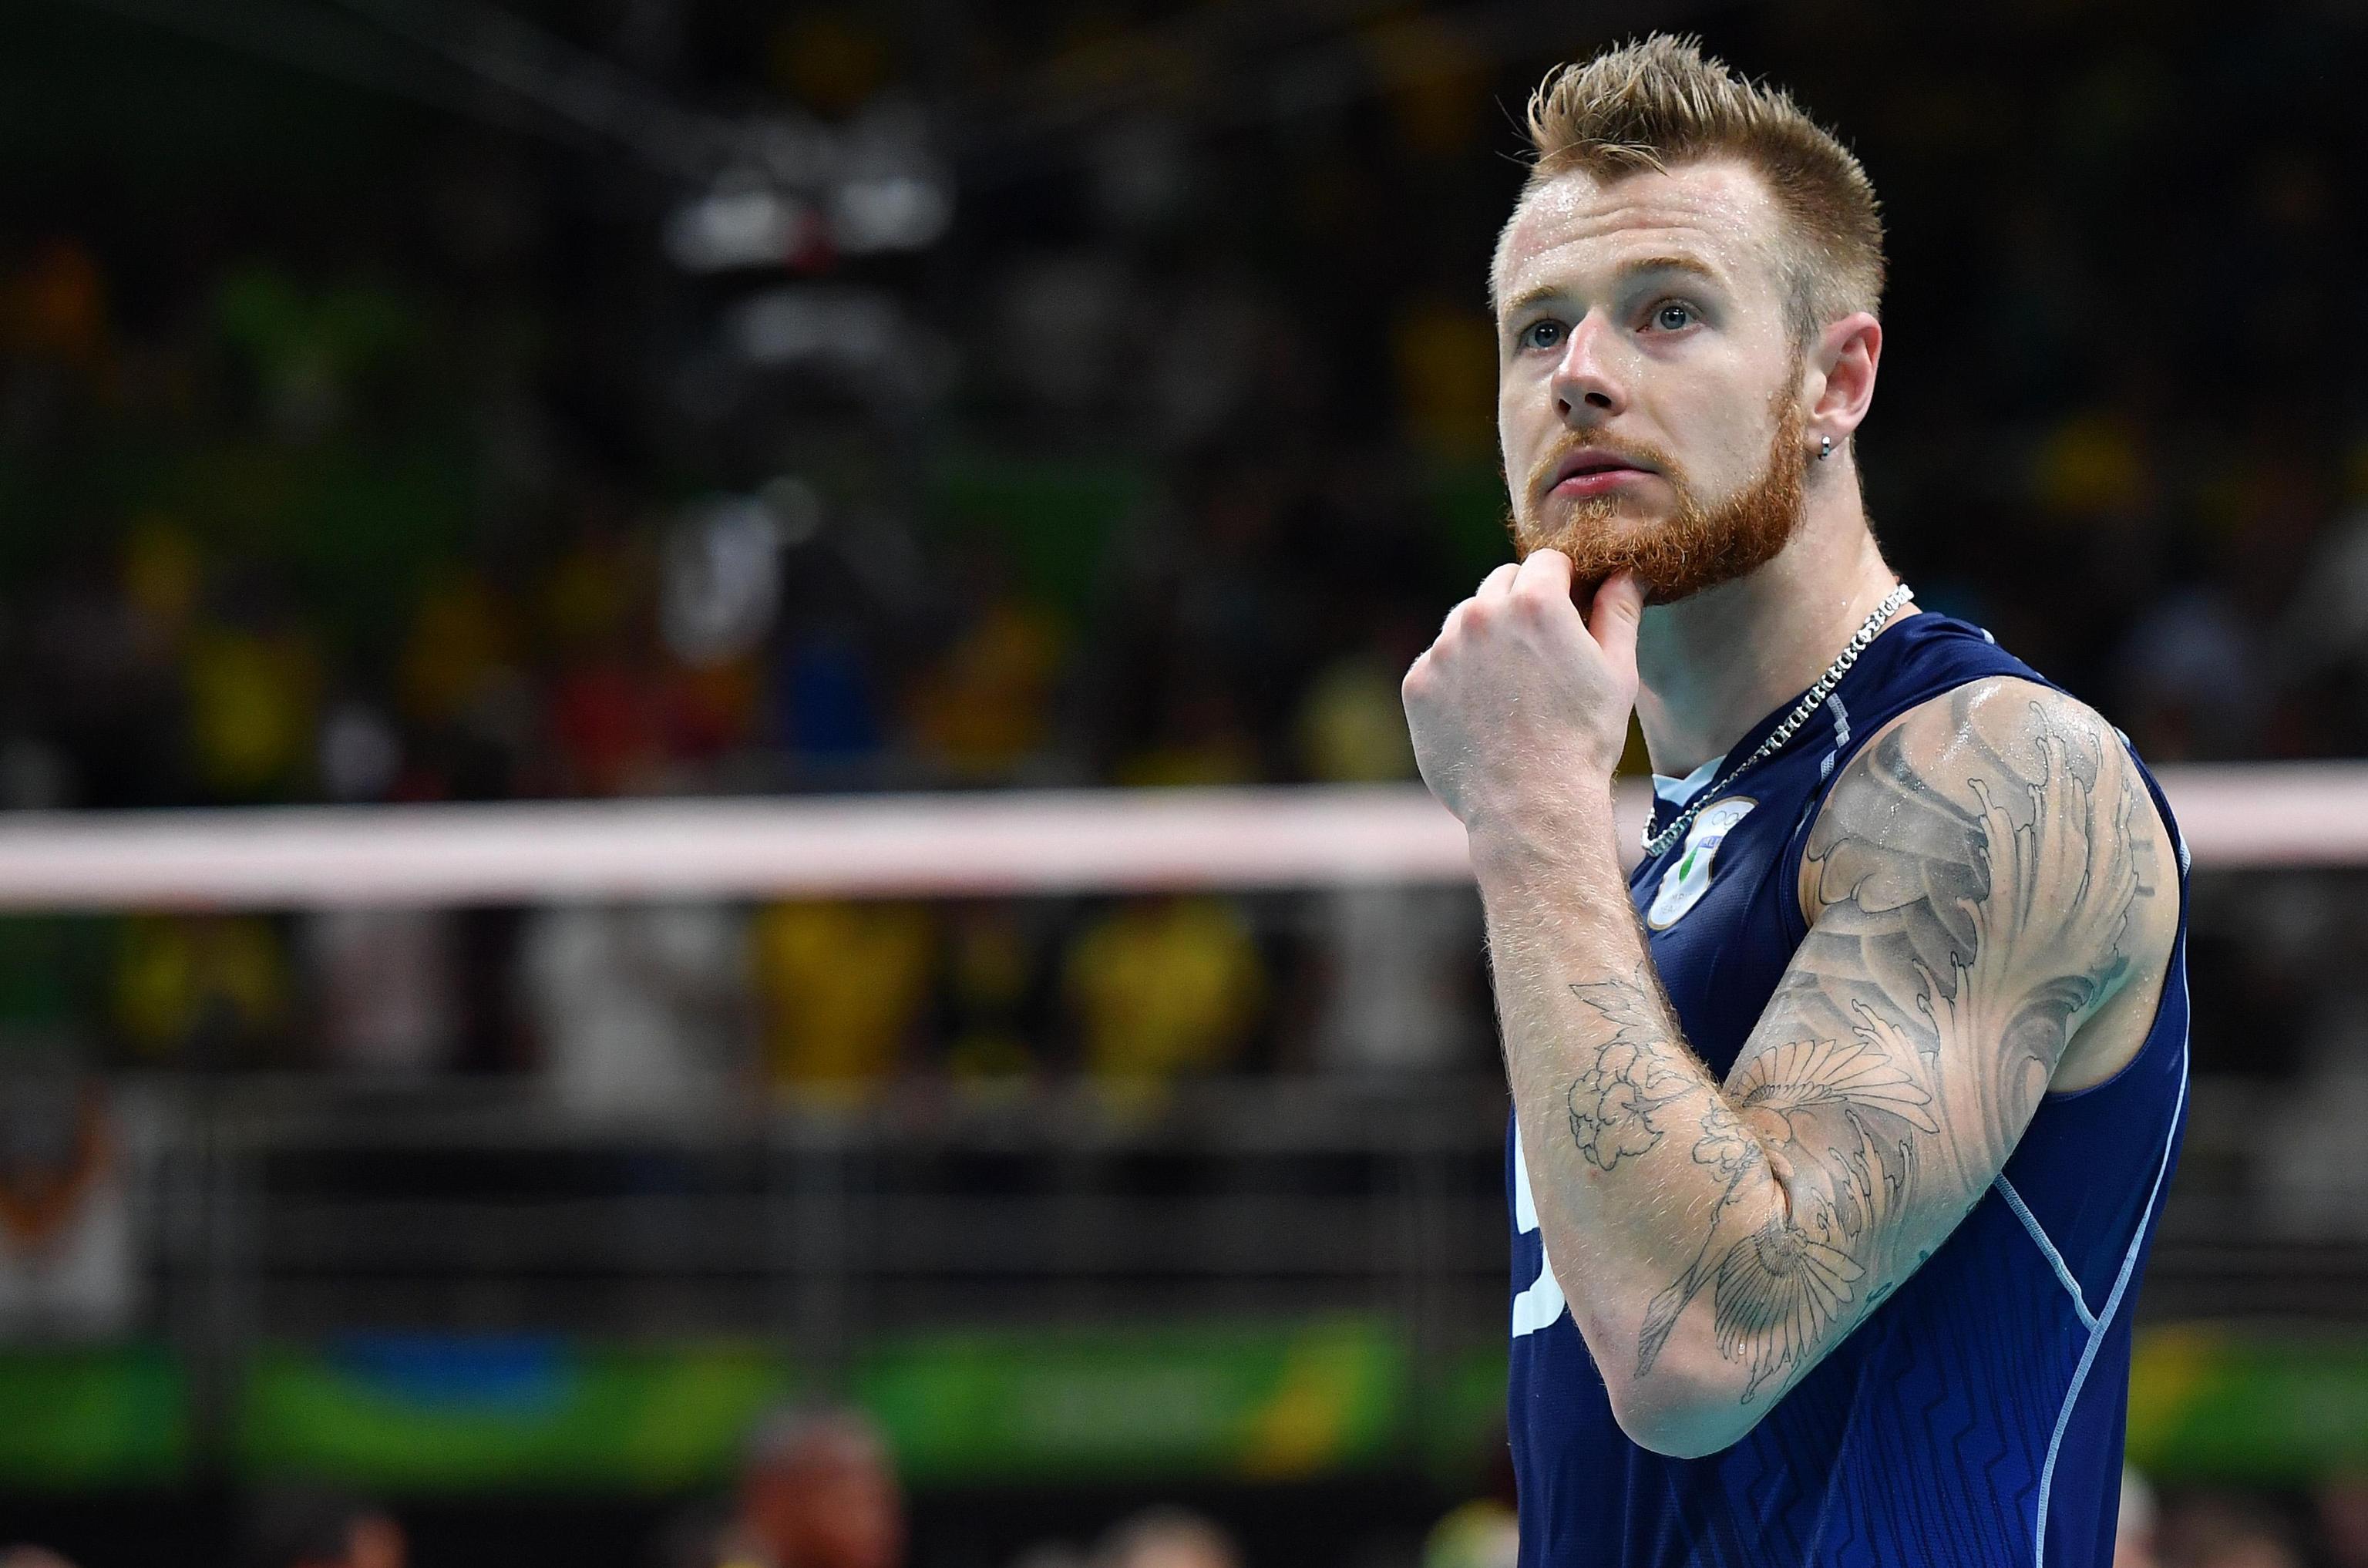 Star del Volley, Ivan Zaytsev vaccina la figlia: i no vax lo insultano sui social